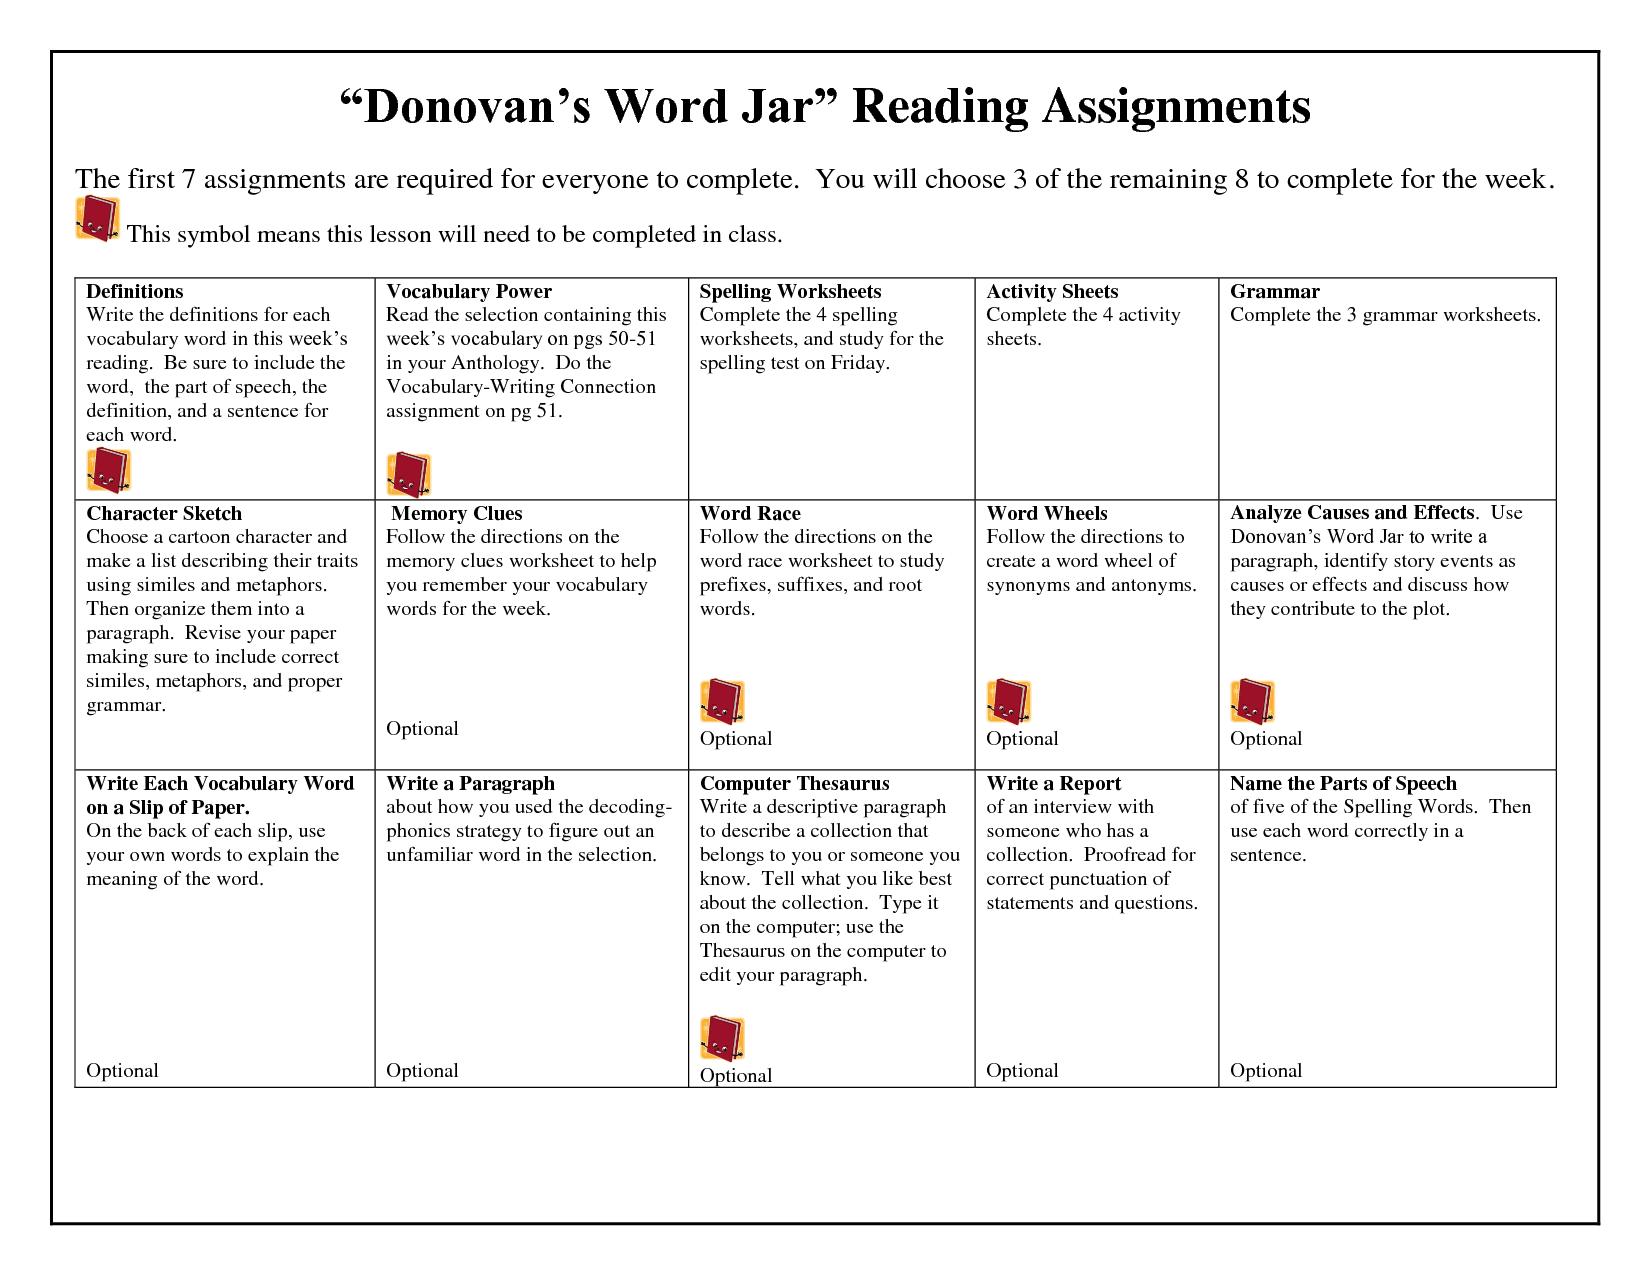 Donovan's Word Jar Lesson Plans   Spelling Worksheets - Doc with Multiplication Worksheets Doc